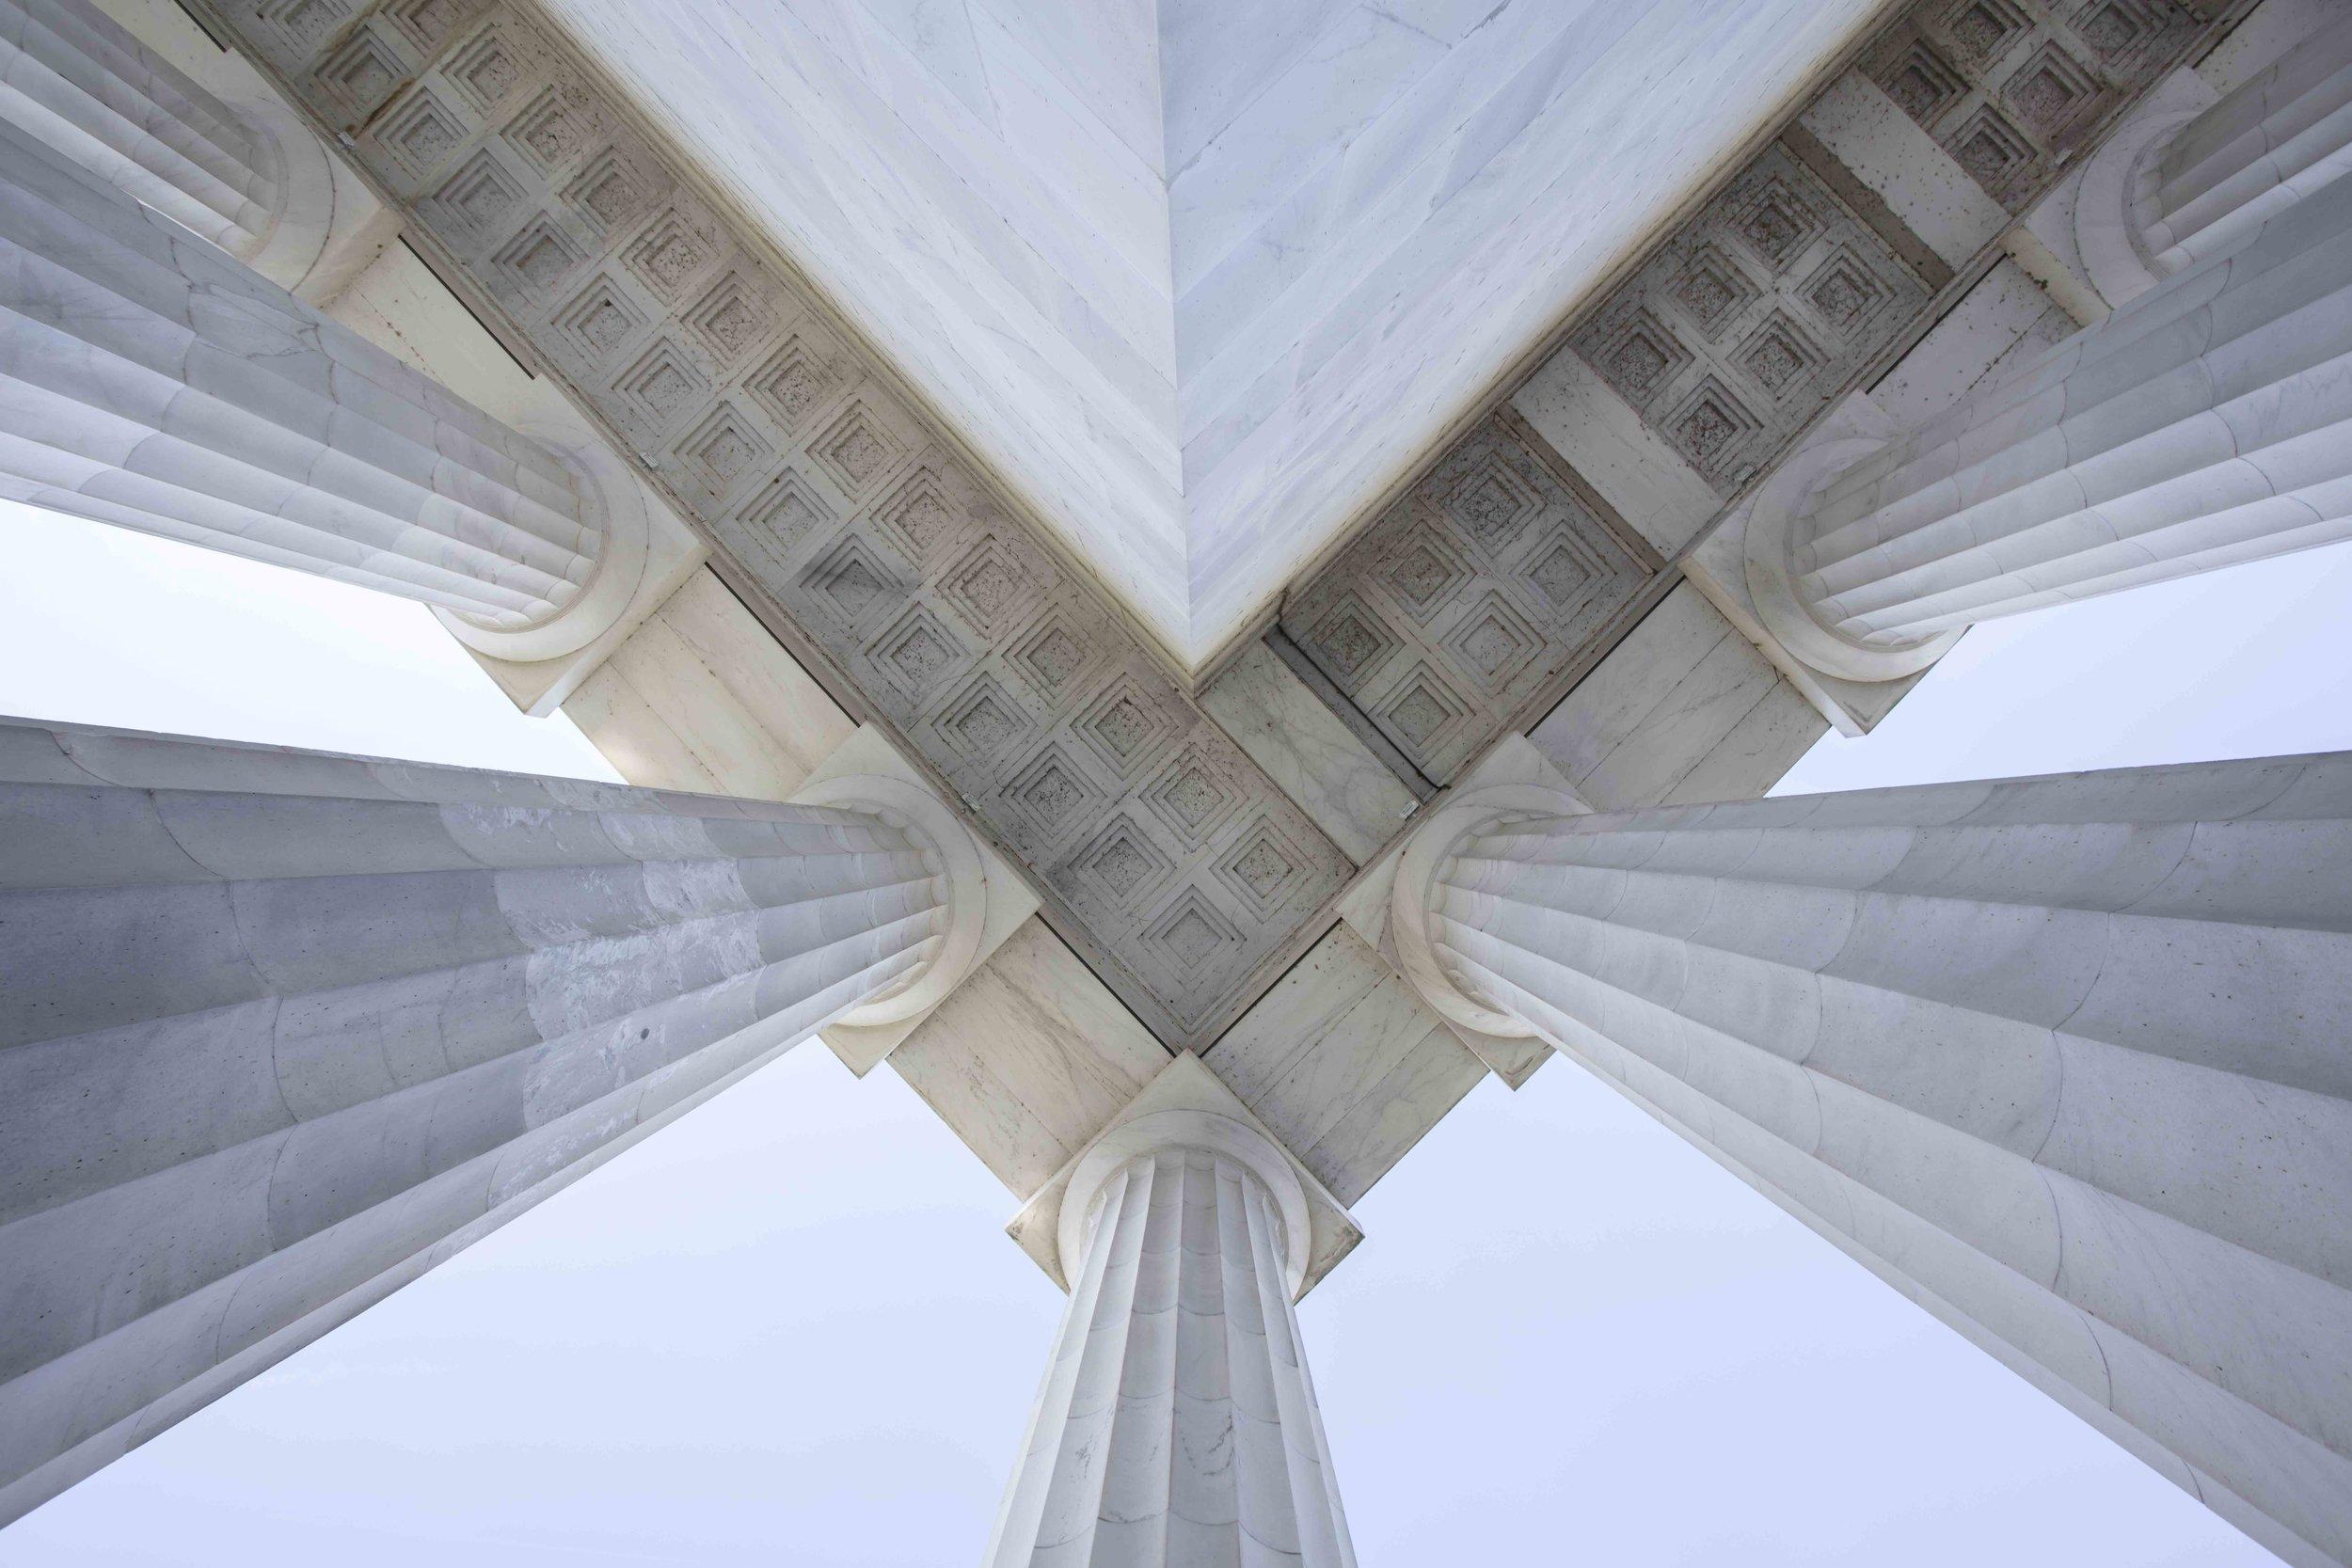 2017 10 Washington DC Architectural-9673.jpg